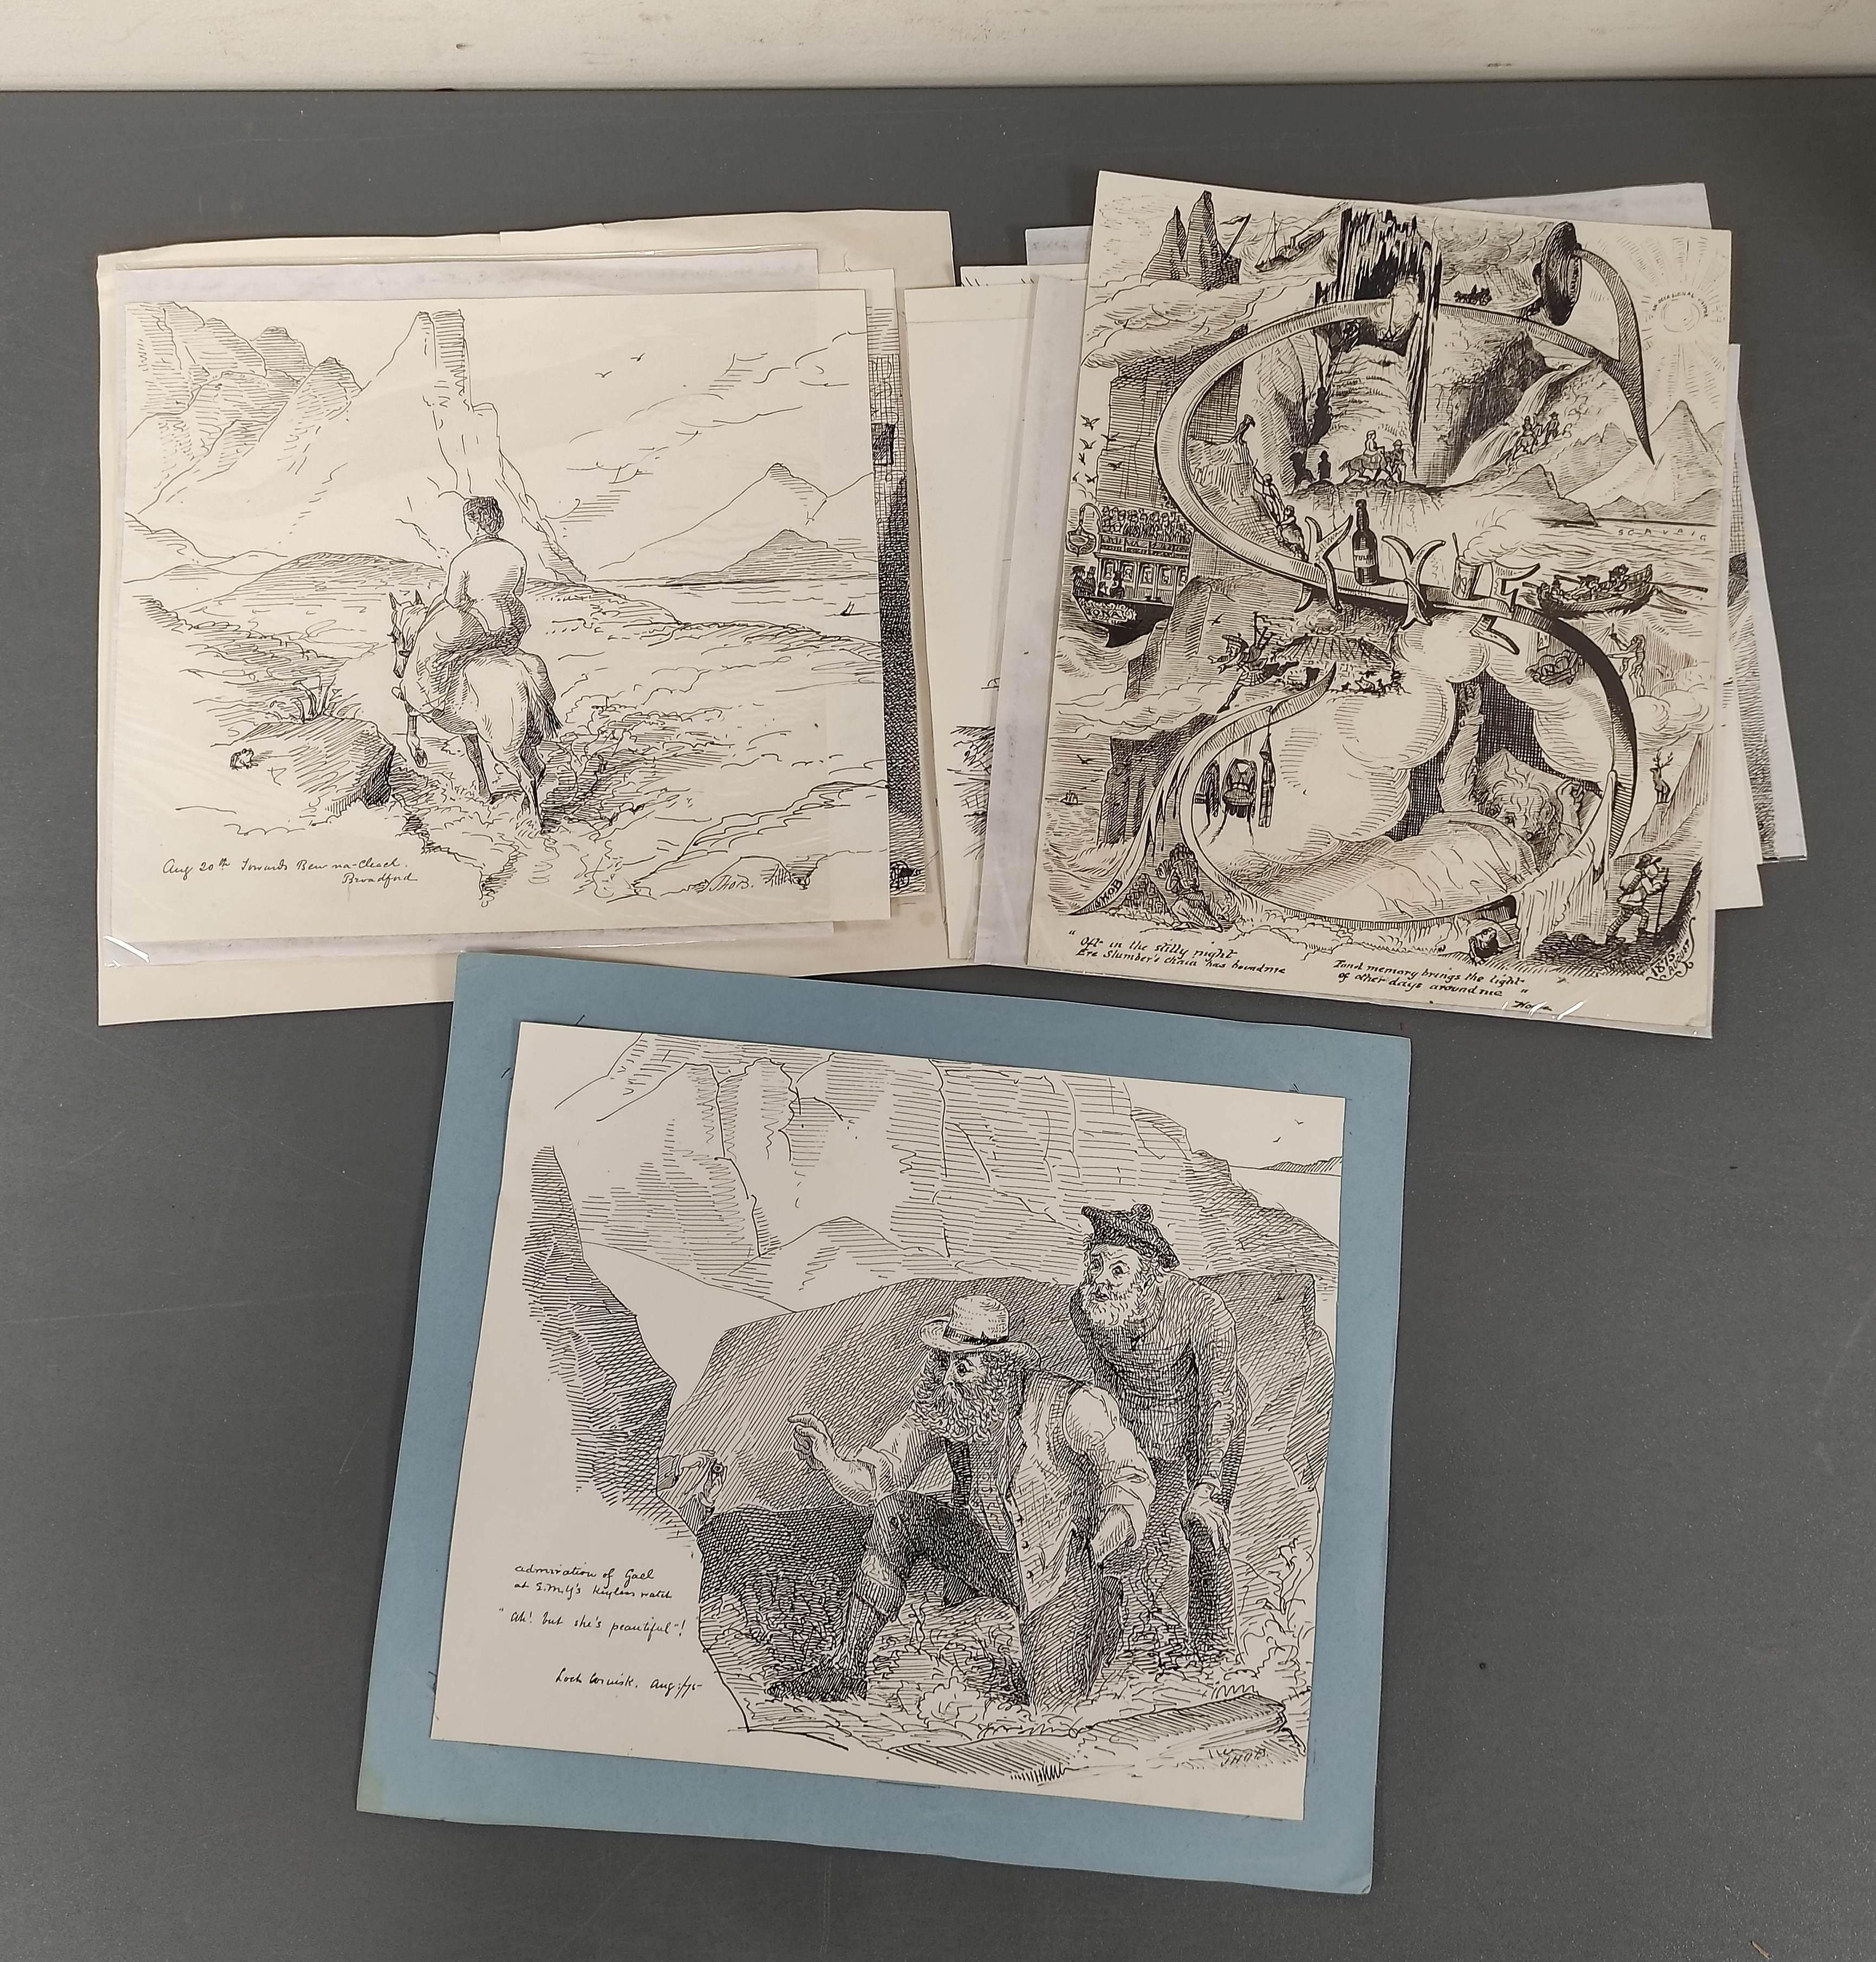 J.H.O.B.- original artwork. 8 comic pen & ink drawings made on a visit to Skye, 1875.